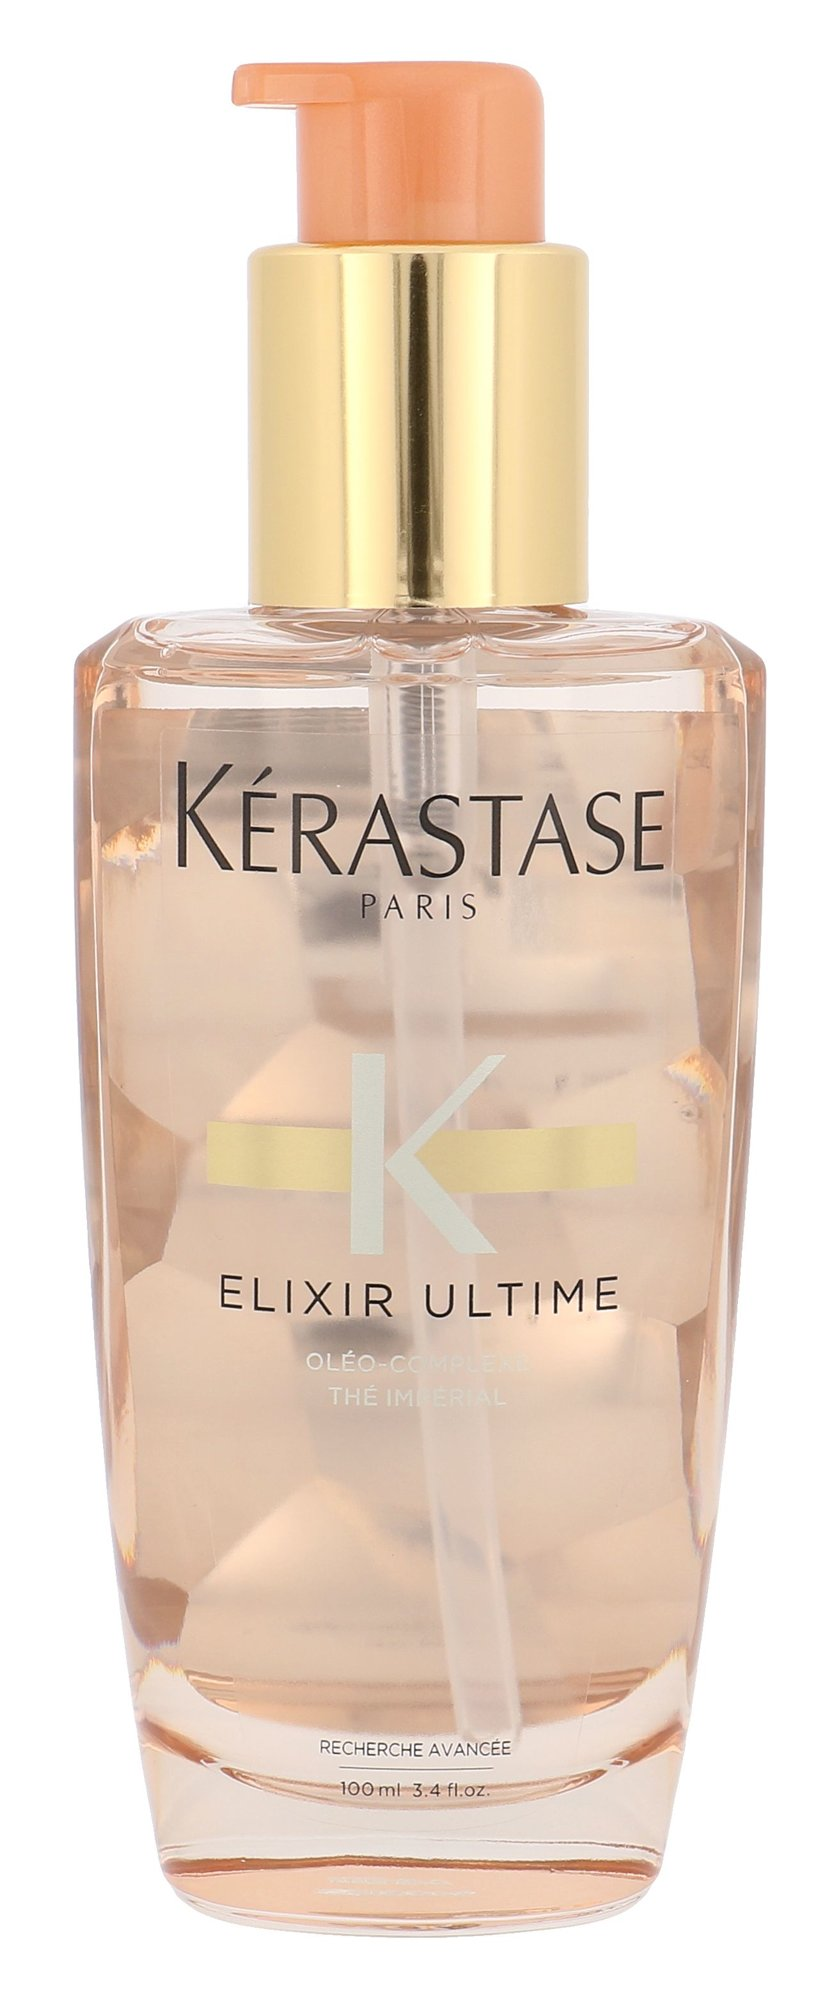 Kérastase Elixir Ultime Cosmetic 100ml  The Imperial